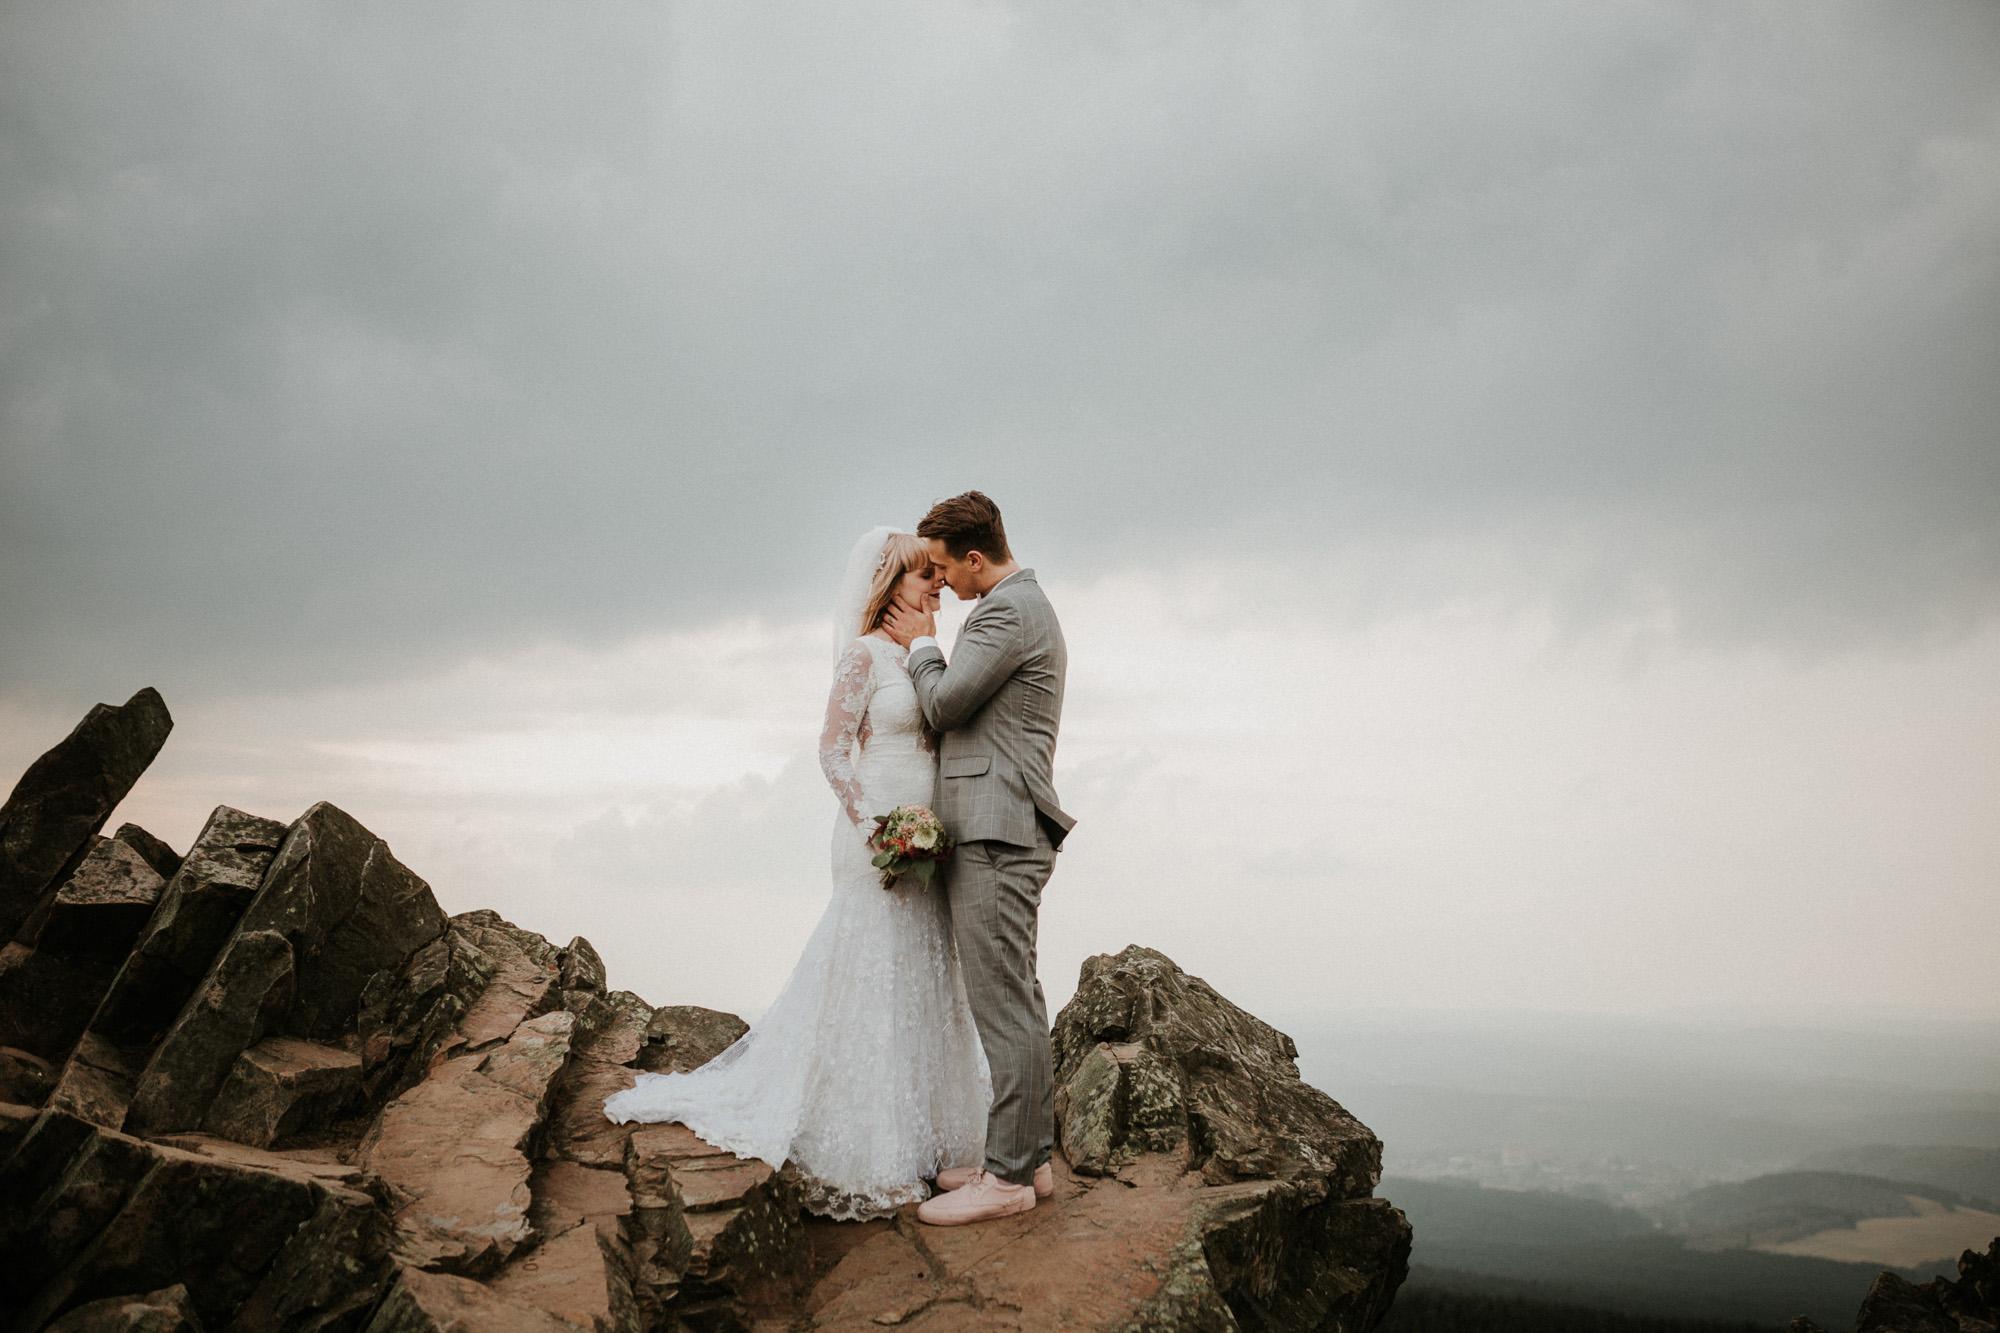 DanielaMarquardtPhotography_Hochzeitsfotograf_Düsseldorf_Köln_Mallorca_Bayern_Austria_Harz_LinaundMaik_Afterwedding-Shooting_Weddingphotographer_Ibiza_Tuskany_Italien_Toskana9